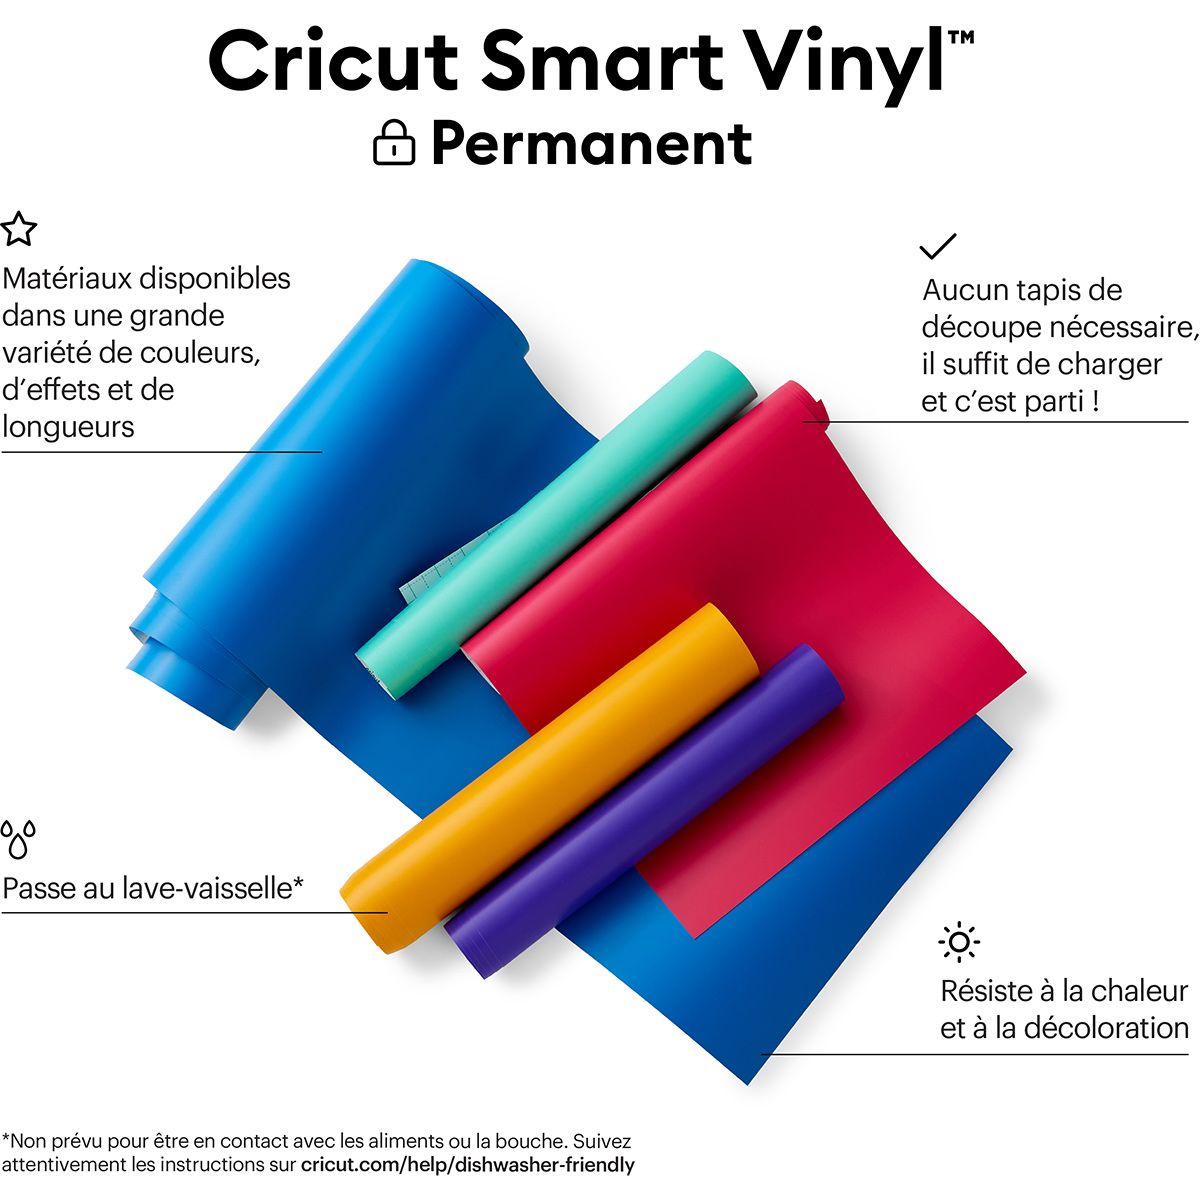 Film vinyle permanent 33 cm x 366 cm Cricut